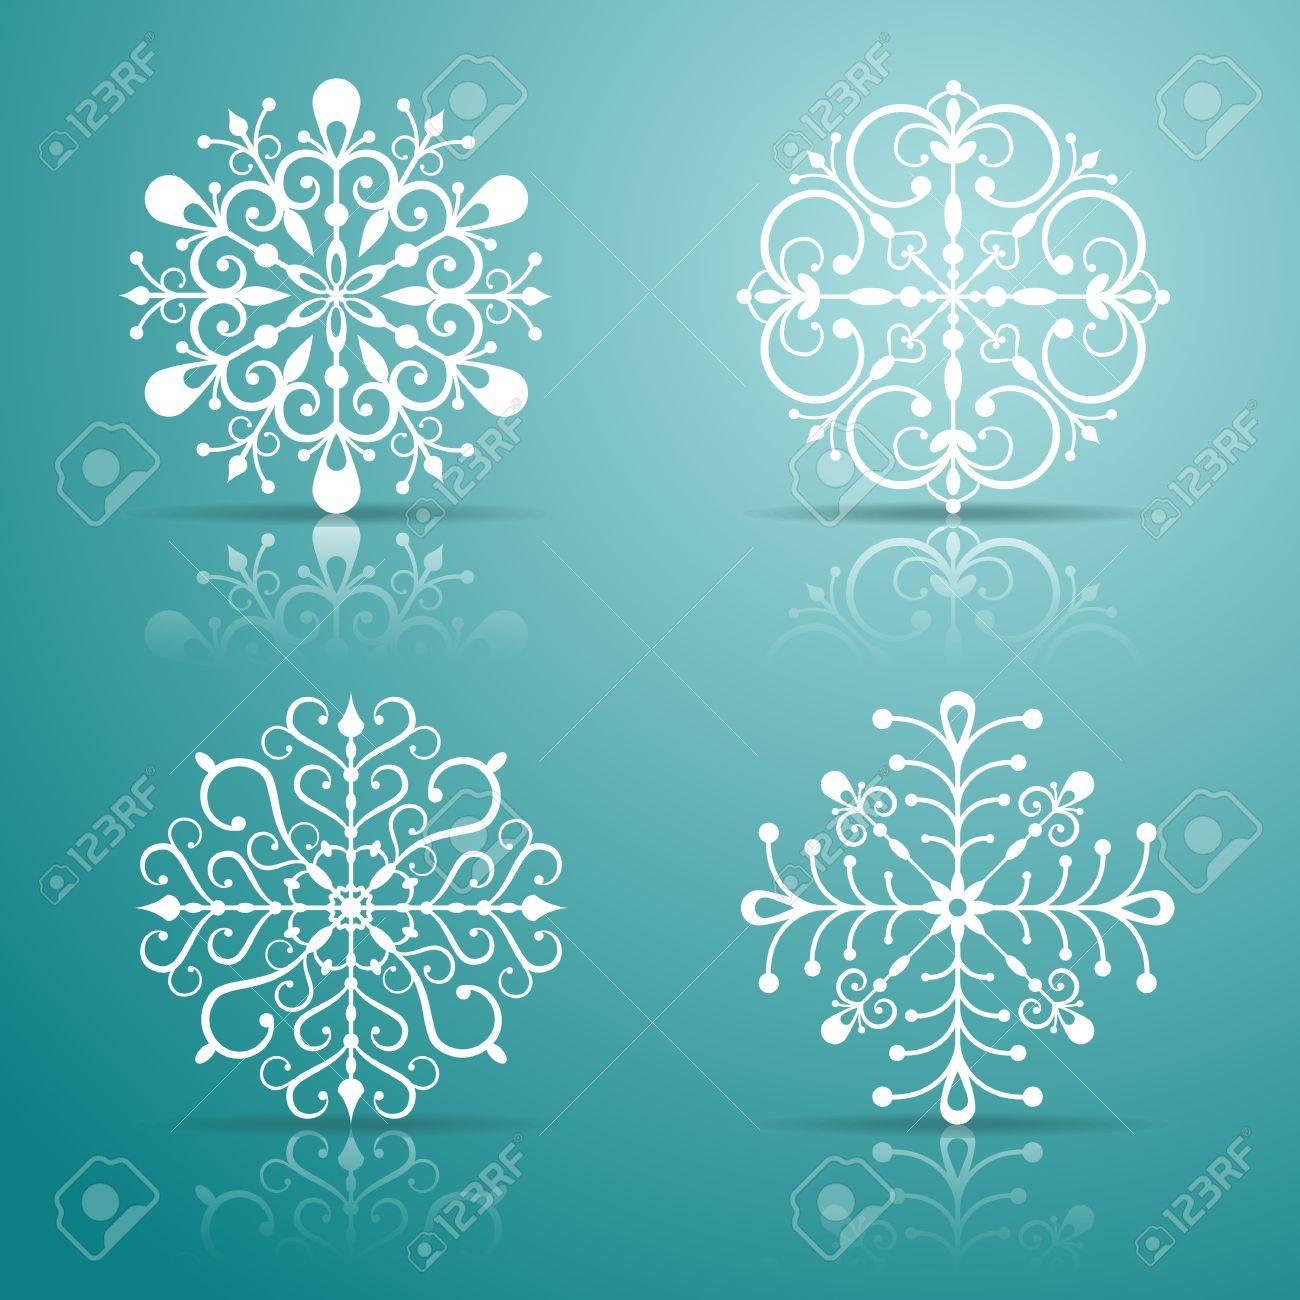 Decorative vector Snowflakes set for Christmas design  EPS 10 vector illustration  Contains opacity masks Stock Vector - 14298457